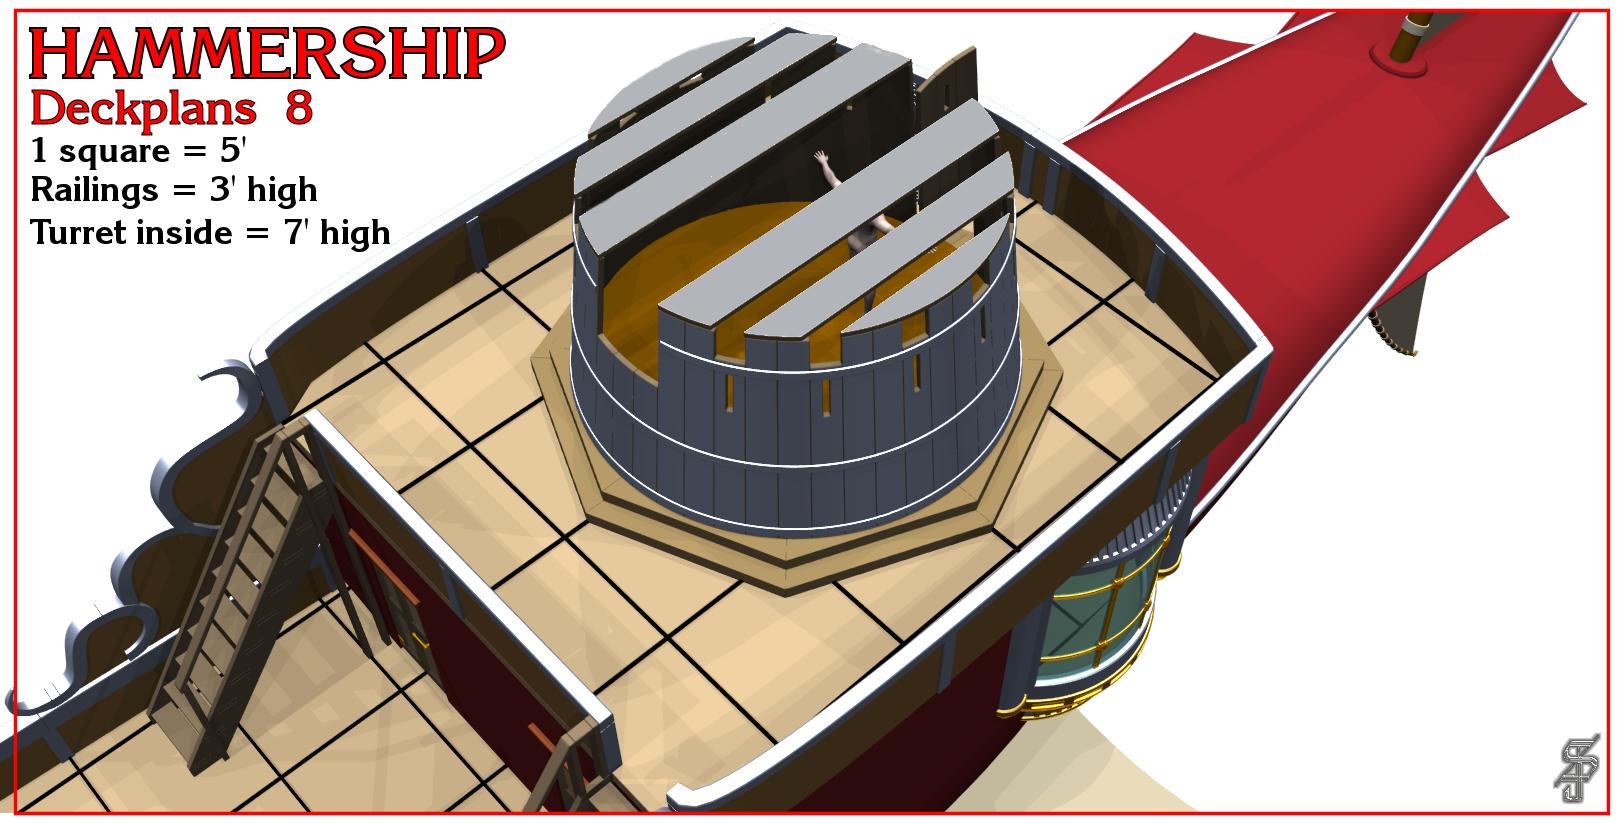 Hammership layout 8